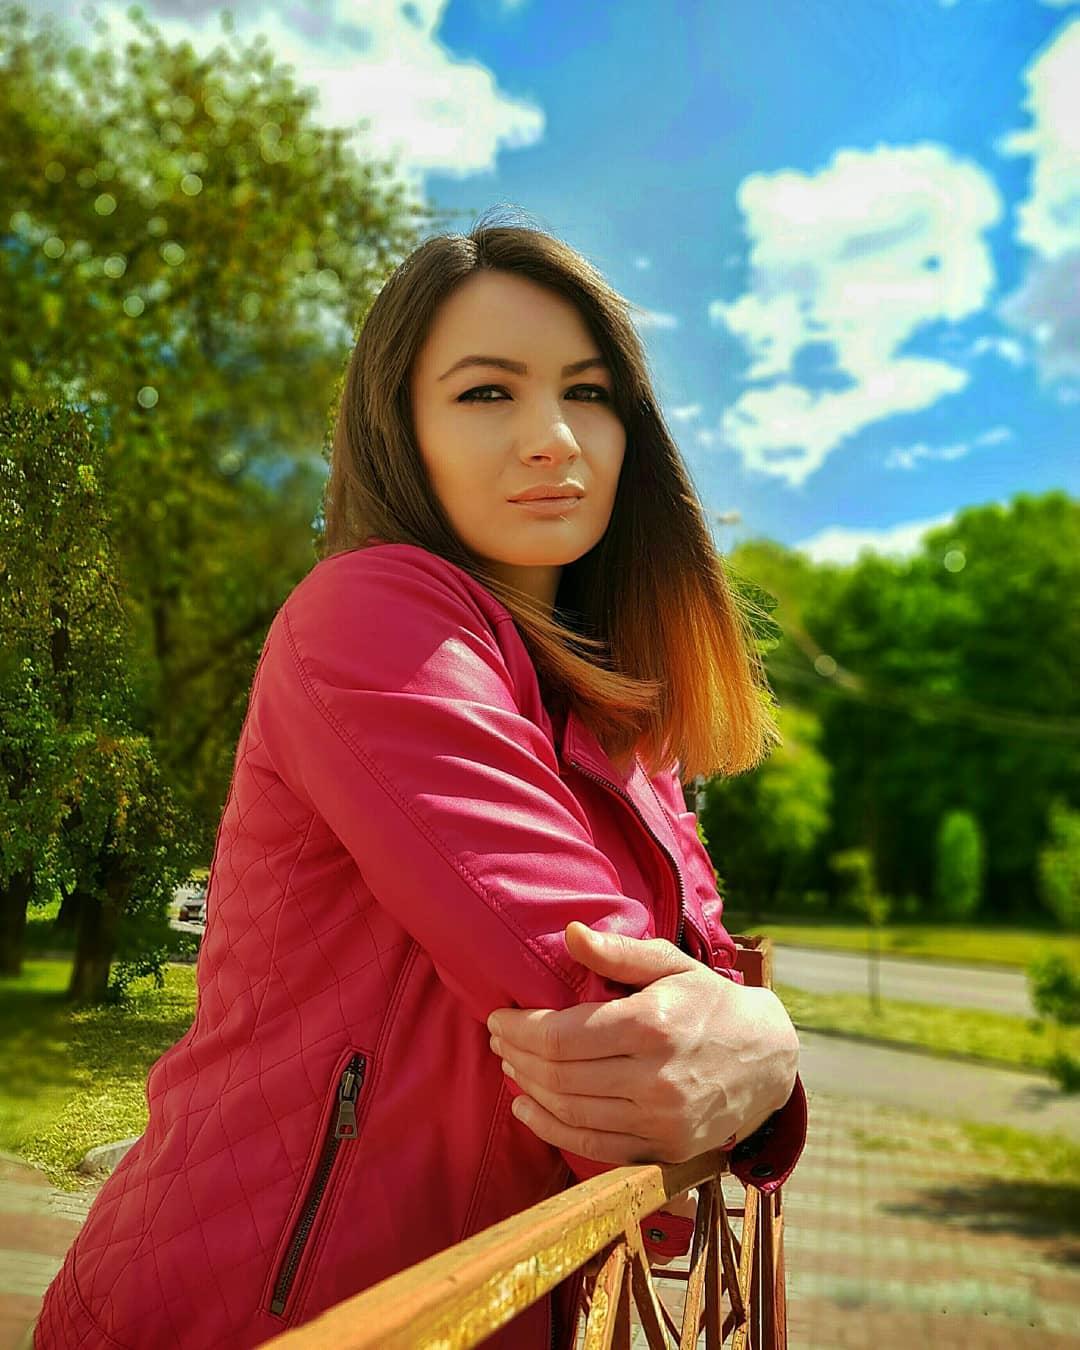 Olga-Madych-Wallpapers-Insta-Fit-Bio-17